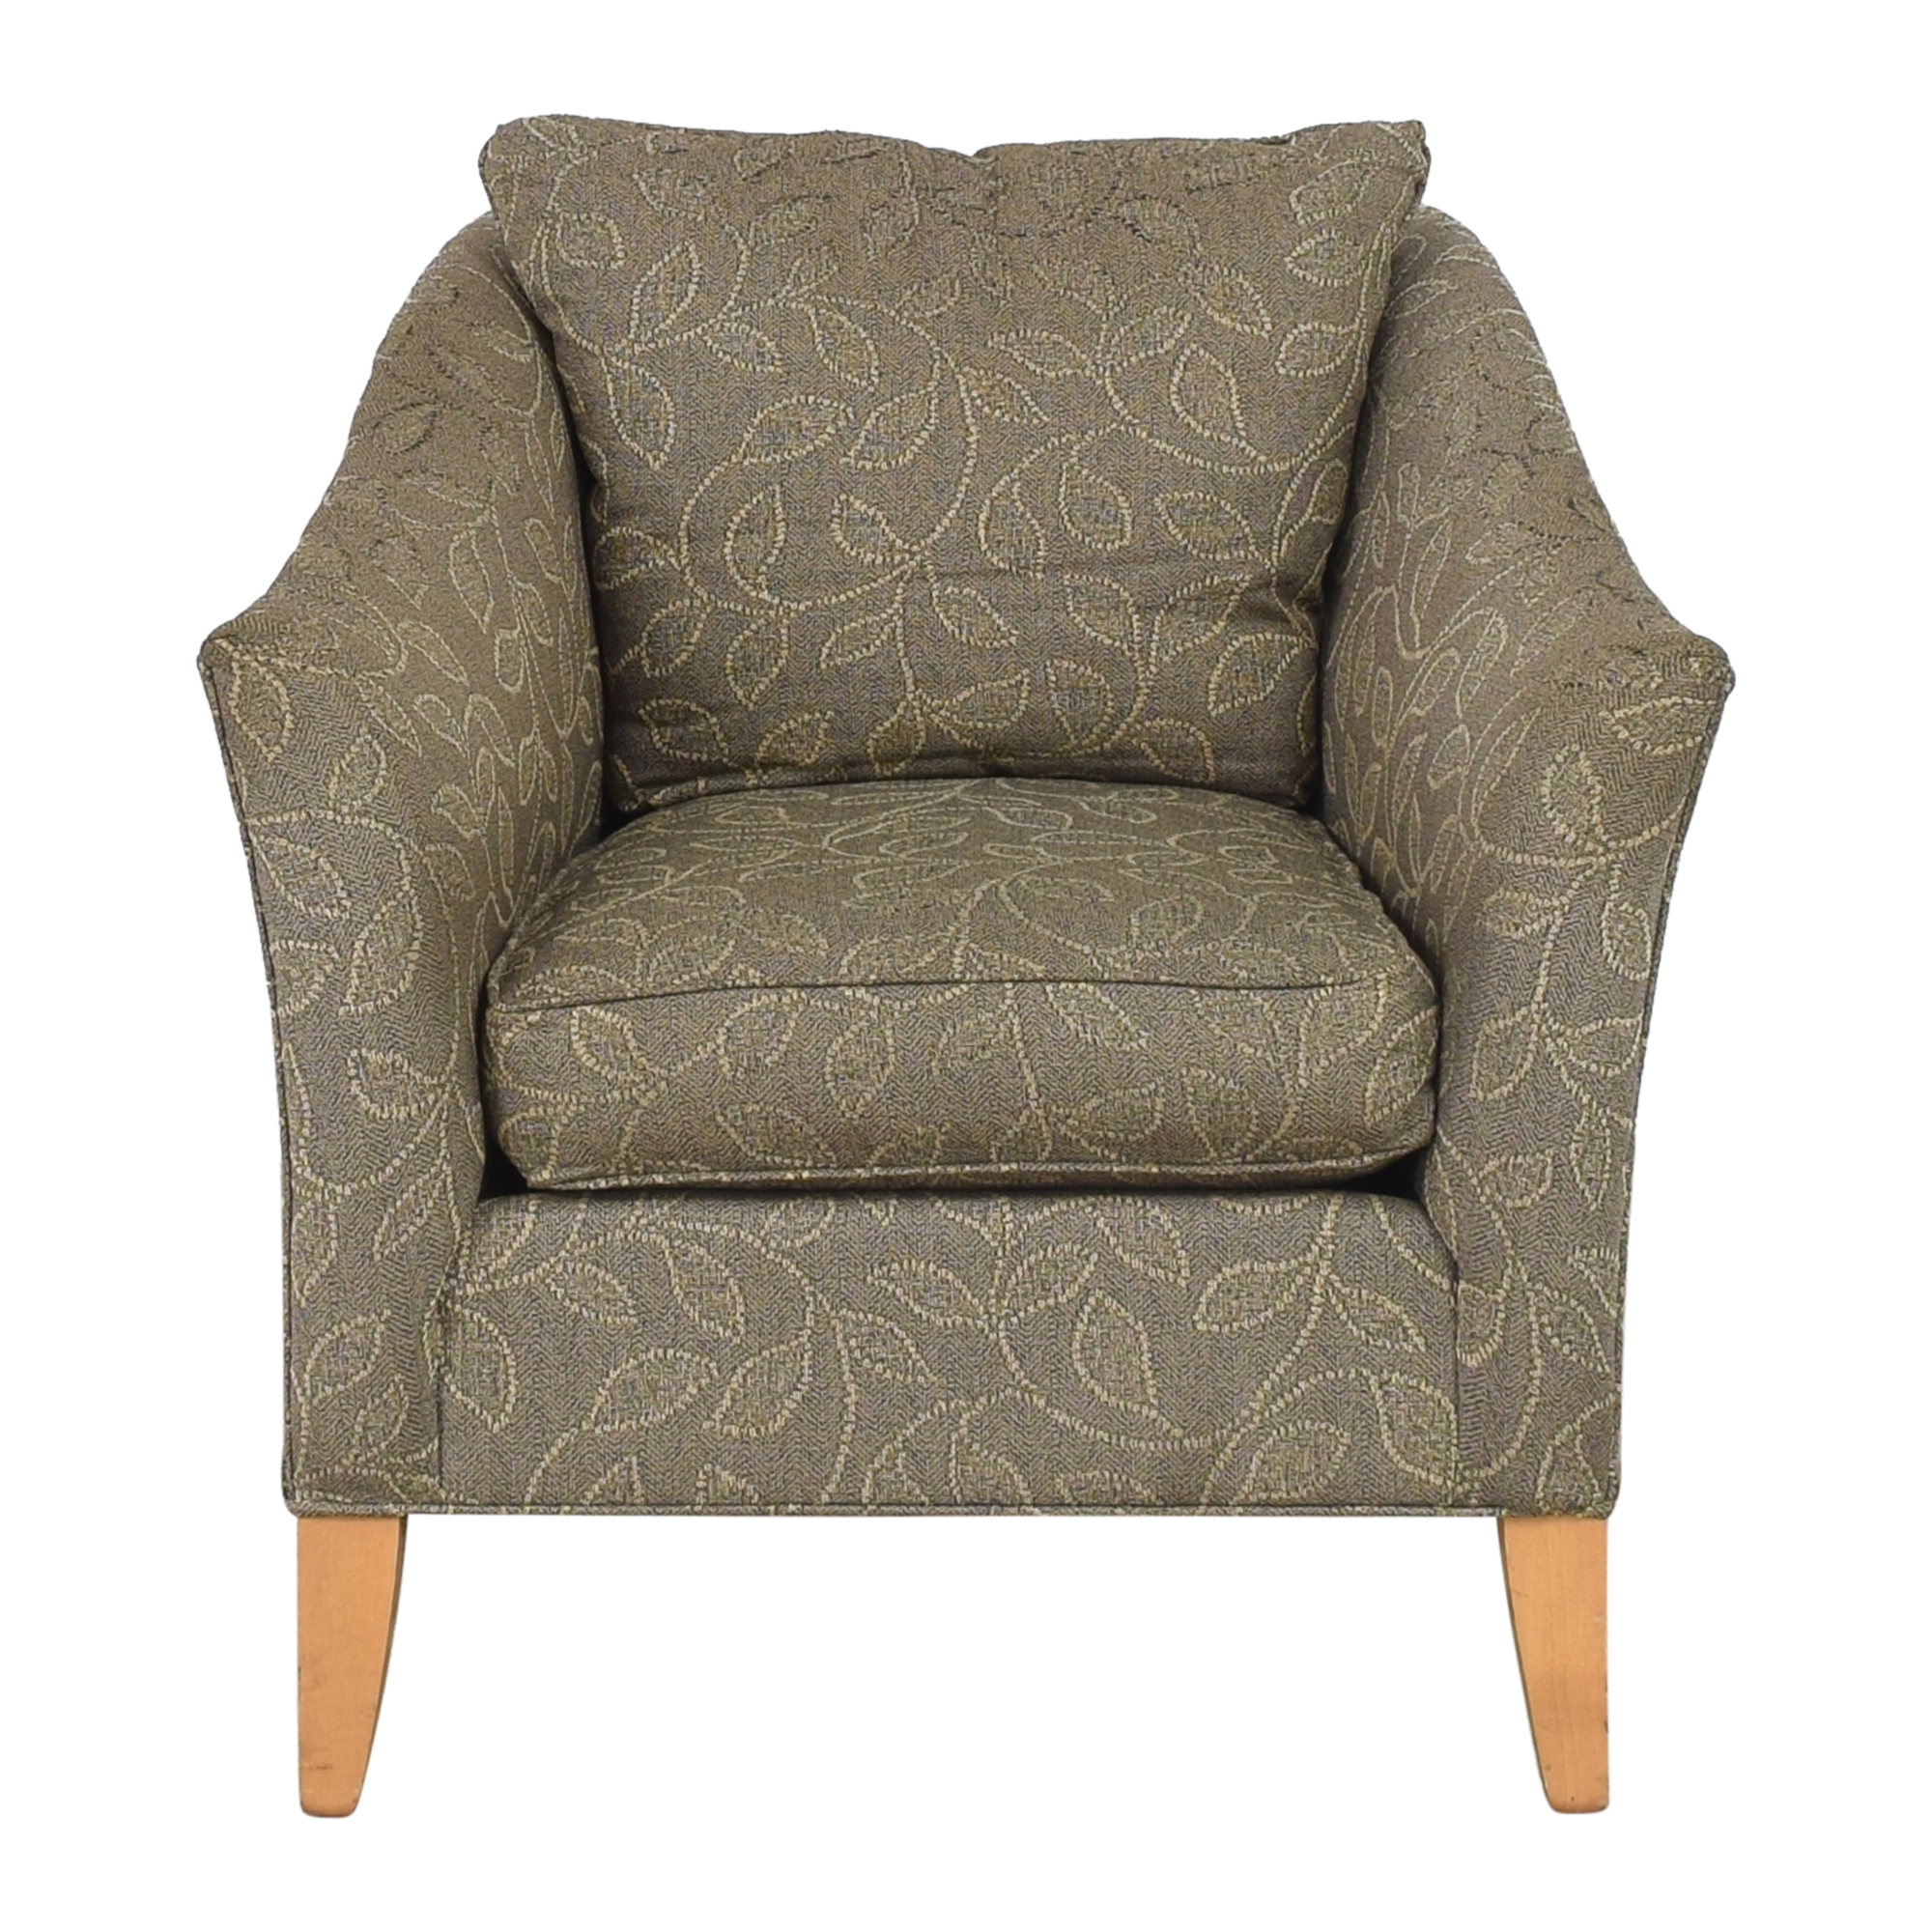 Ethan Allen Gibson Chair sale